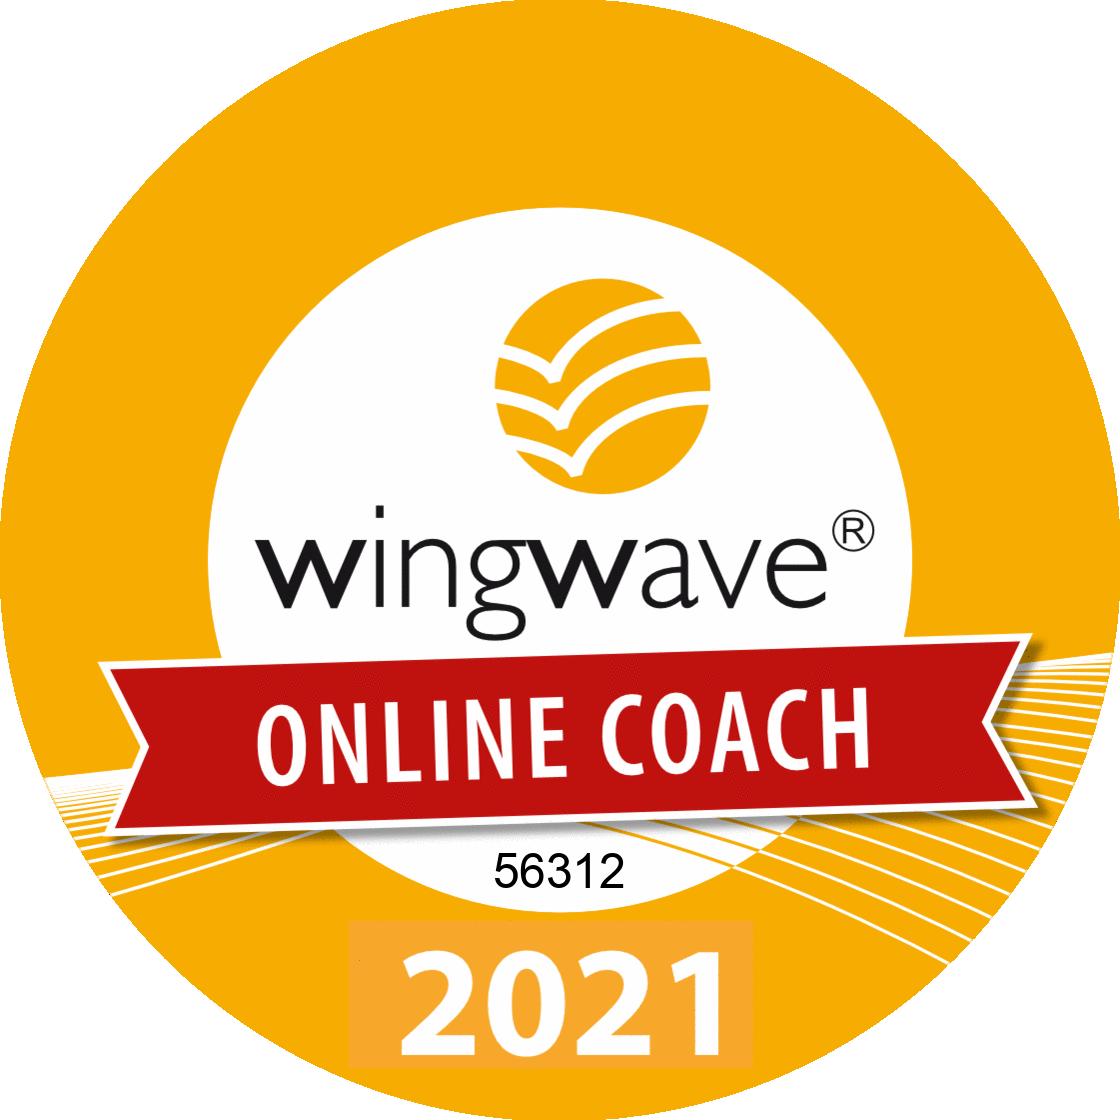 Sello de Calidad Coach wingwave®'21 Online nº 56312